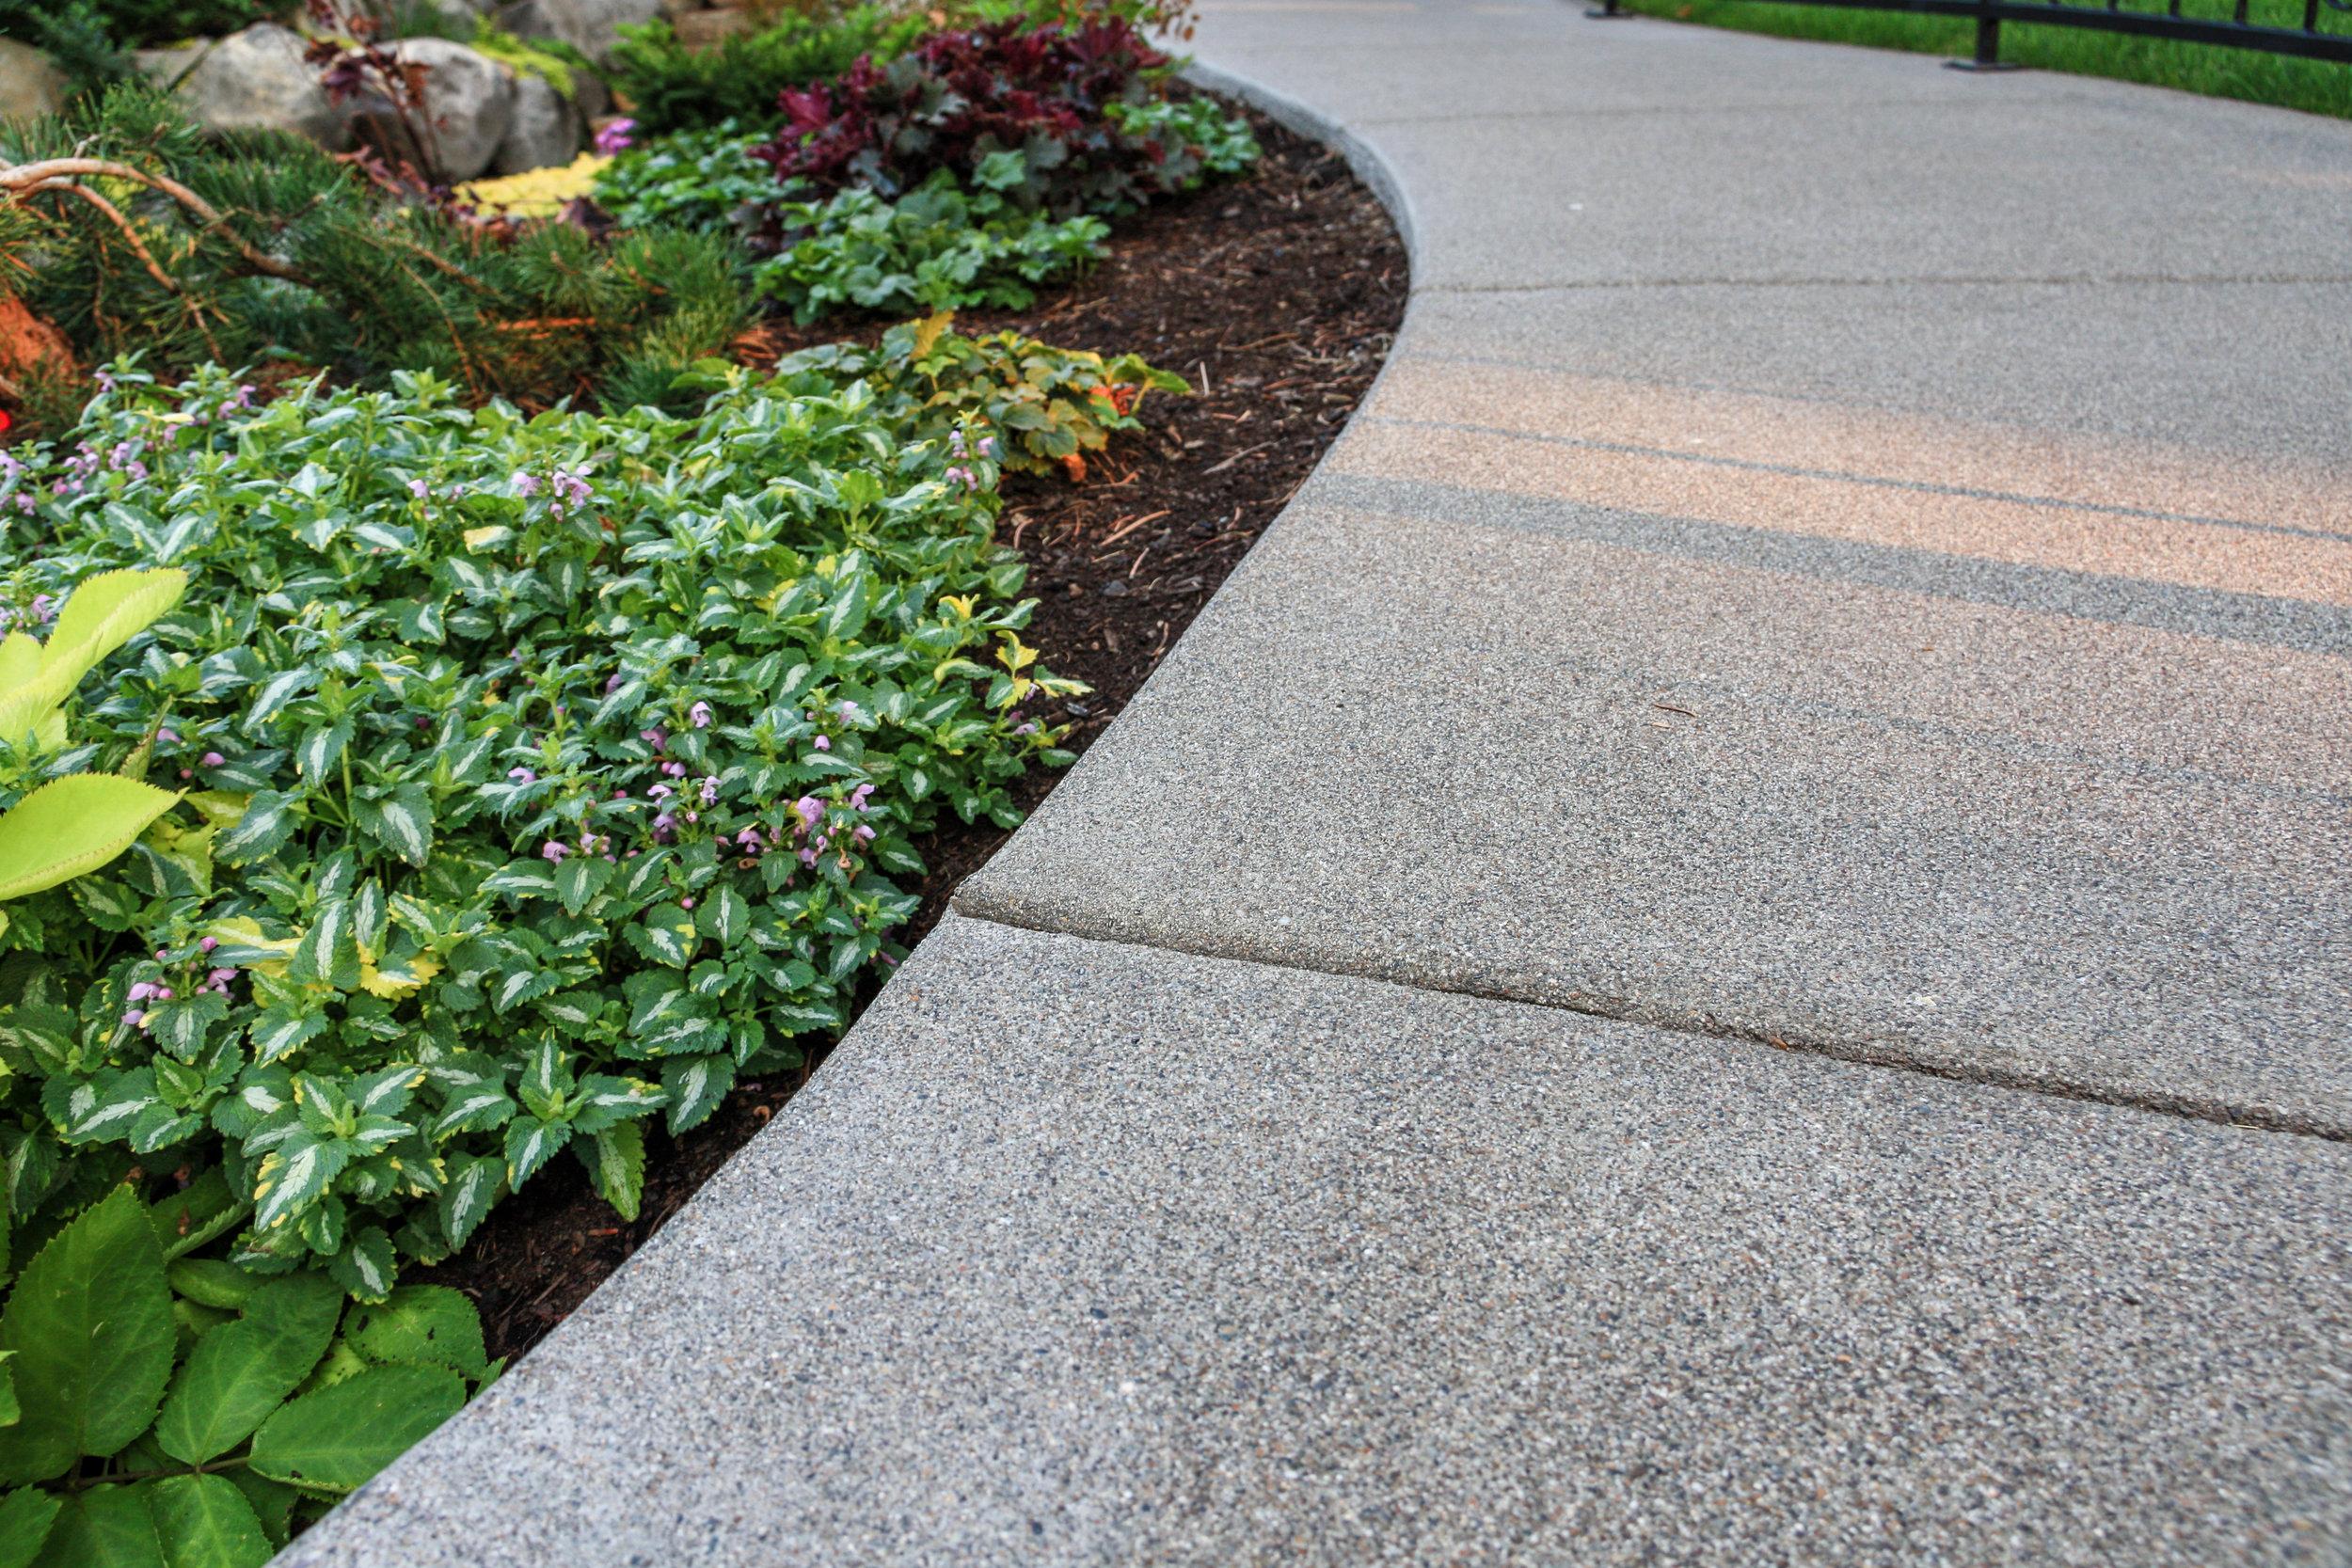 spokane sandwashed concrete sidewalk with anne greenaway lamium